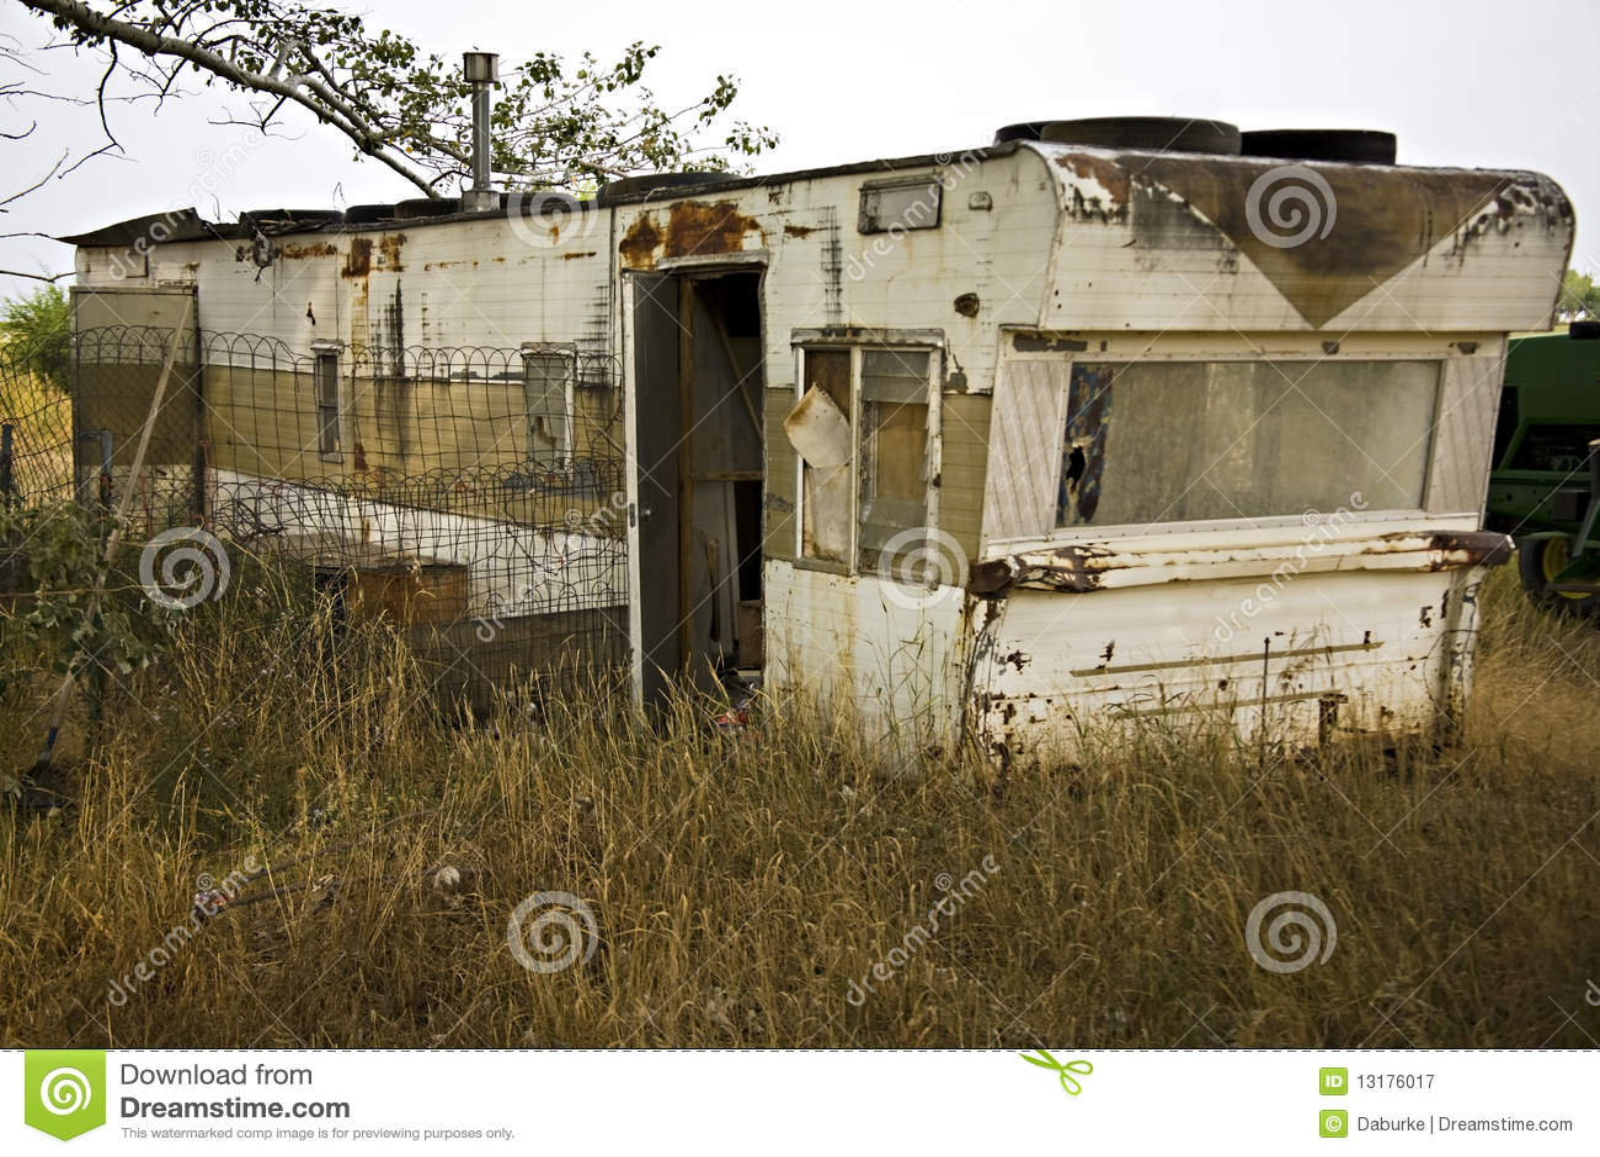 Single wide trailer disrepair junk